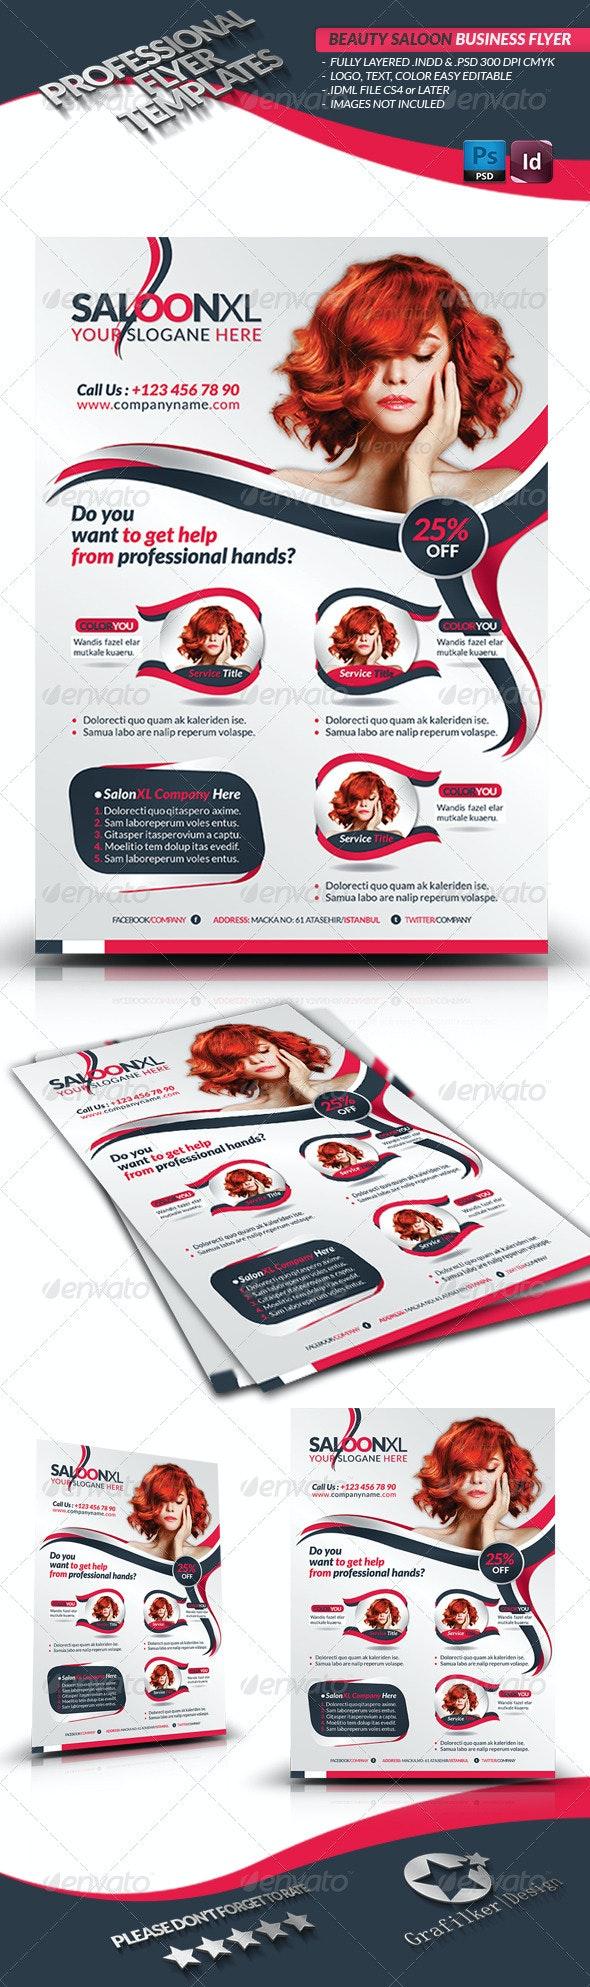 Beauty Salon Business Flyer - Corporate Flyers